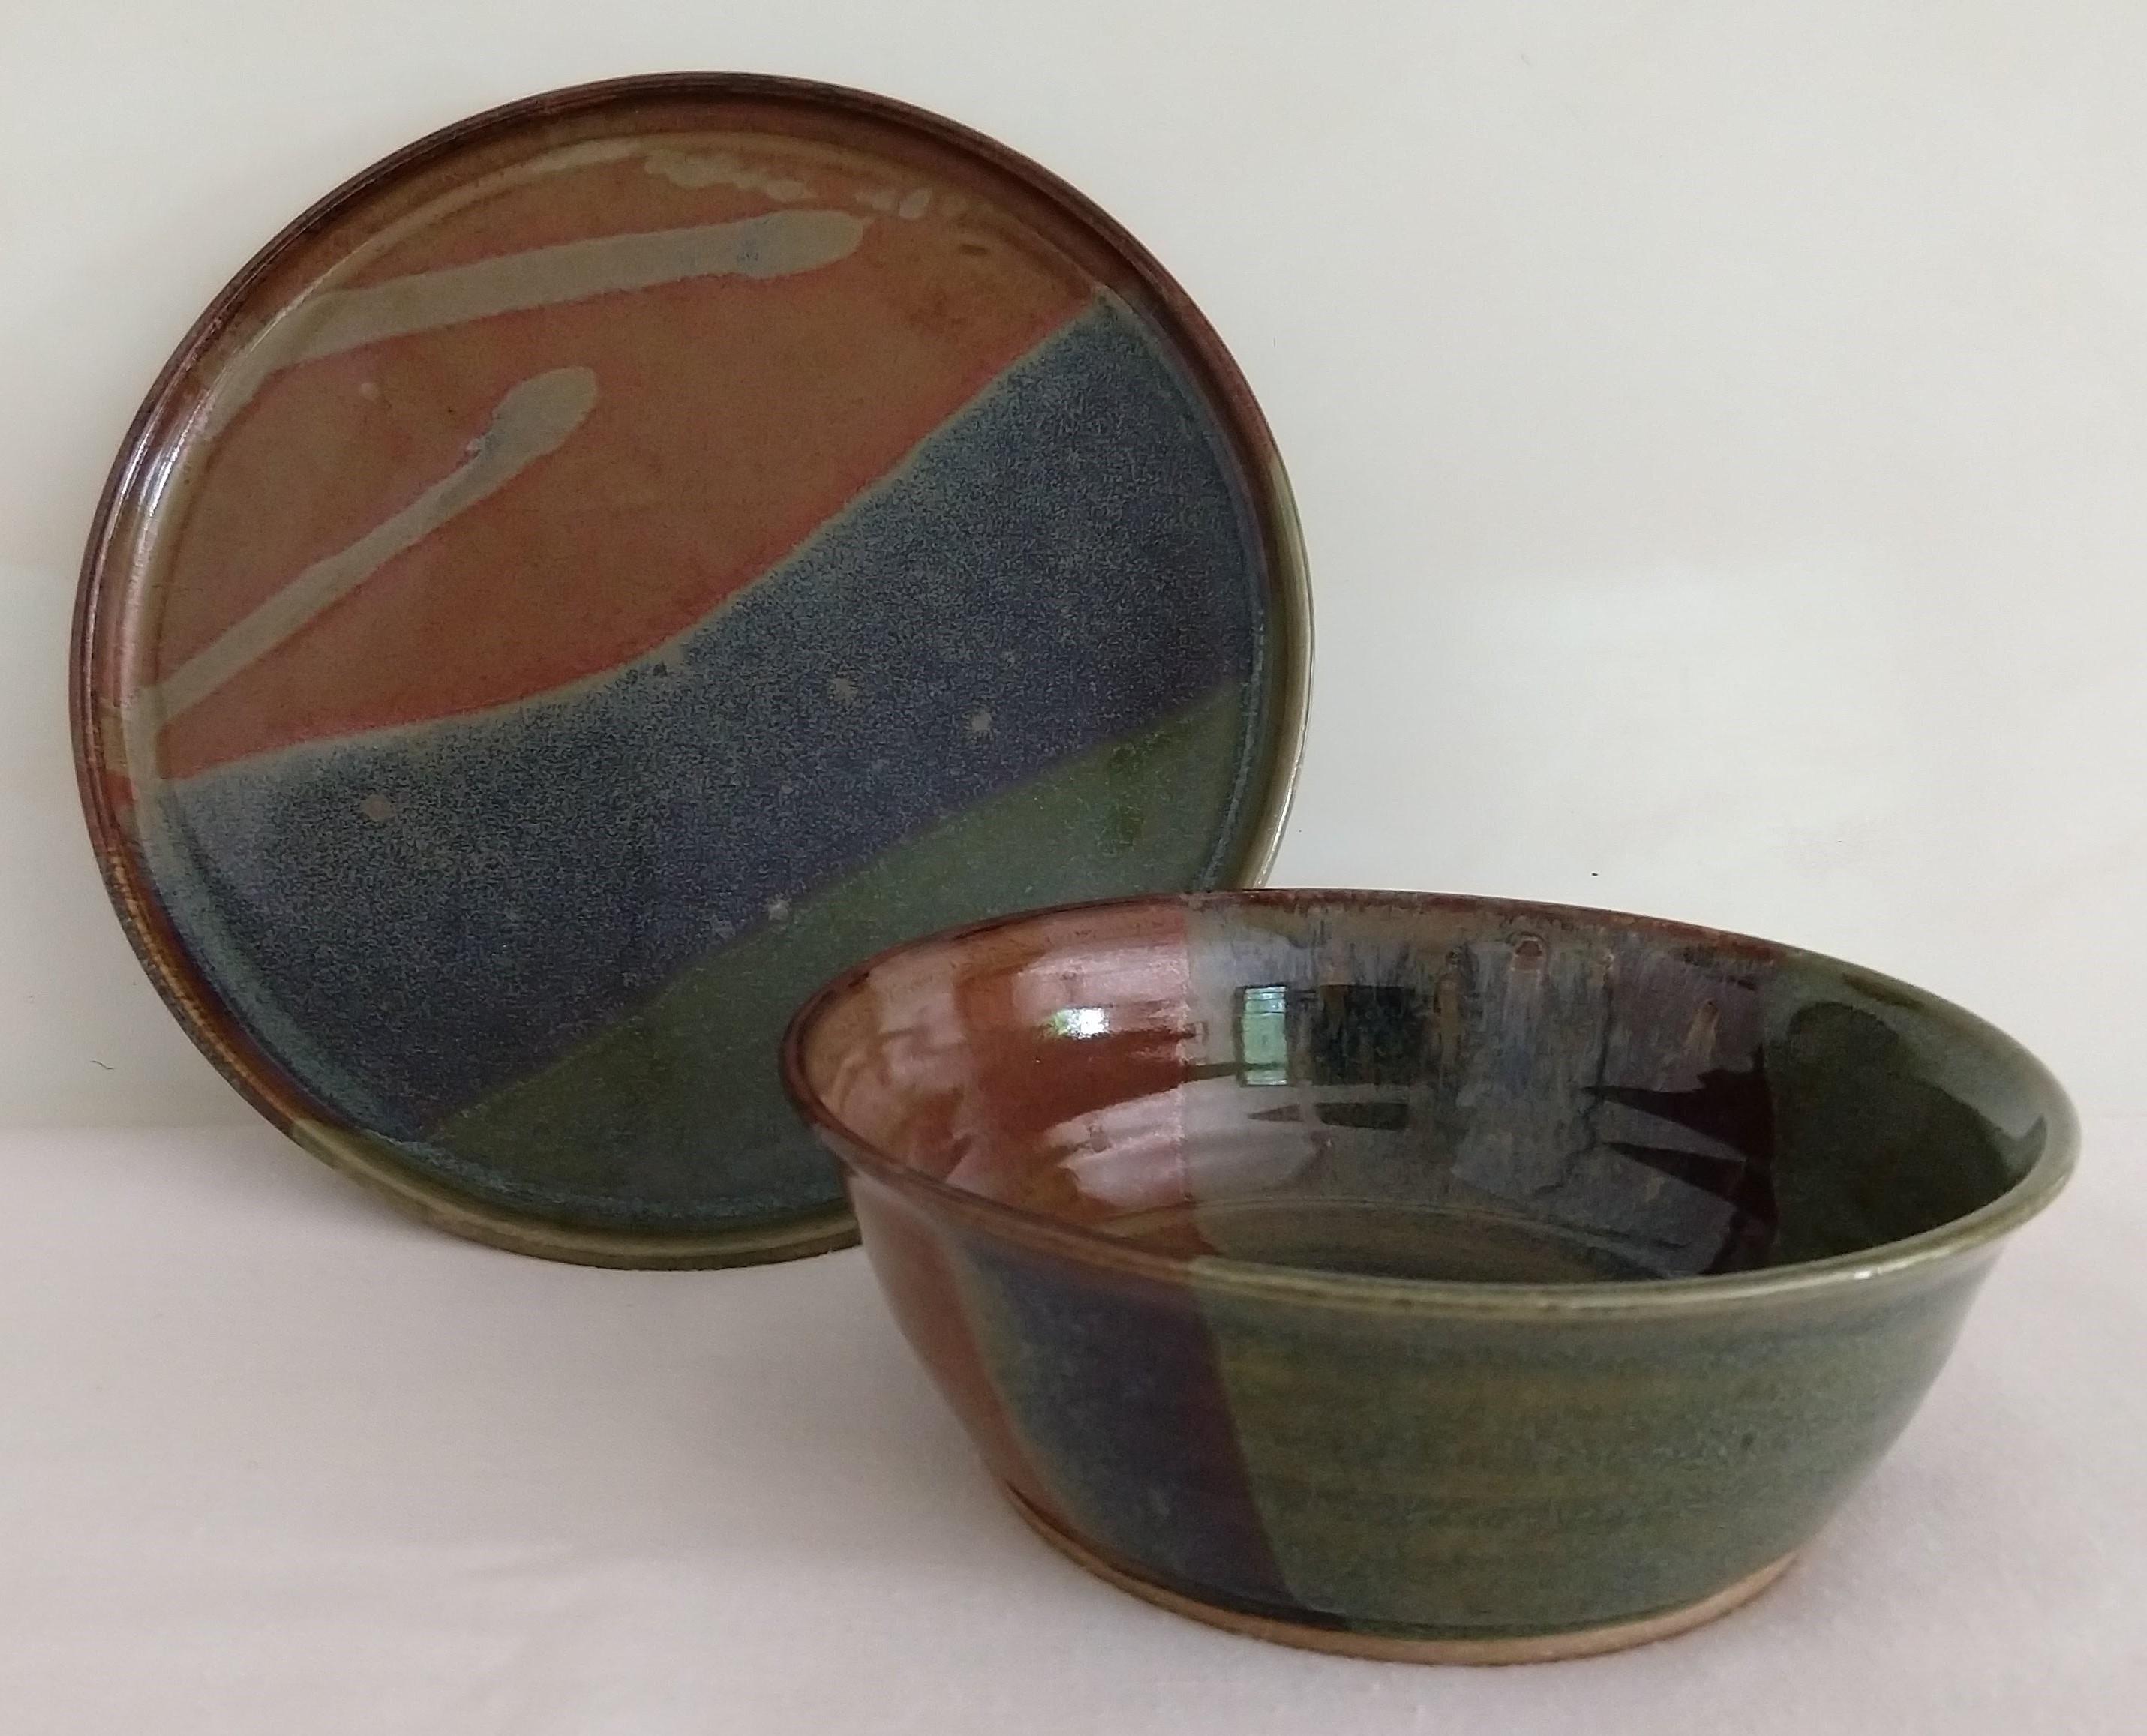 og green plate bowl cropped